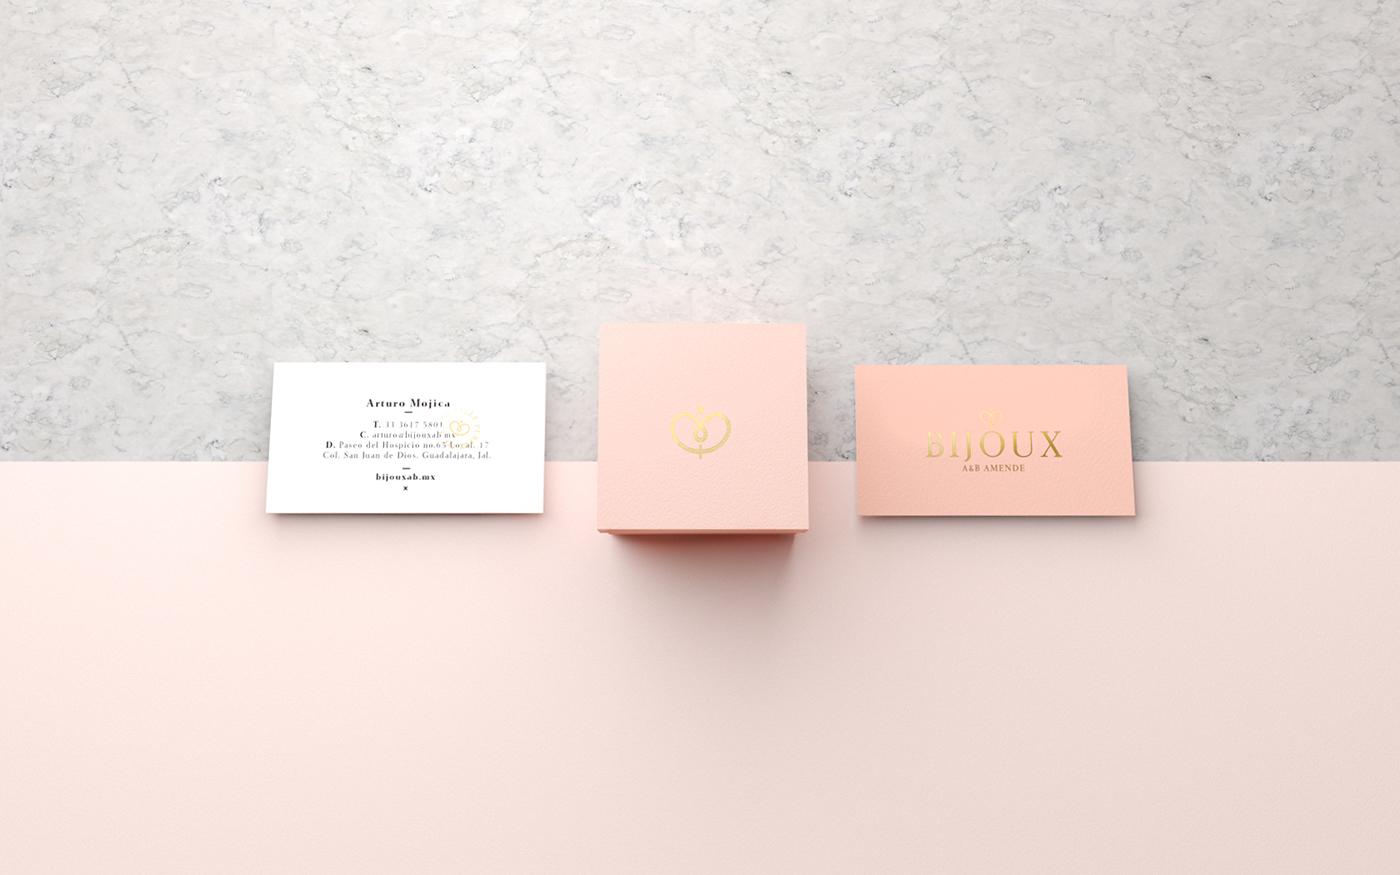 Bijoux珠寶品牌視覺形象設計欣賞-深圳VI設計3